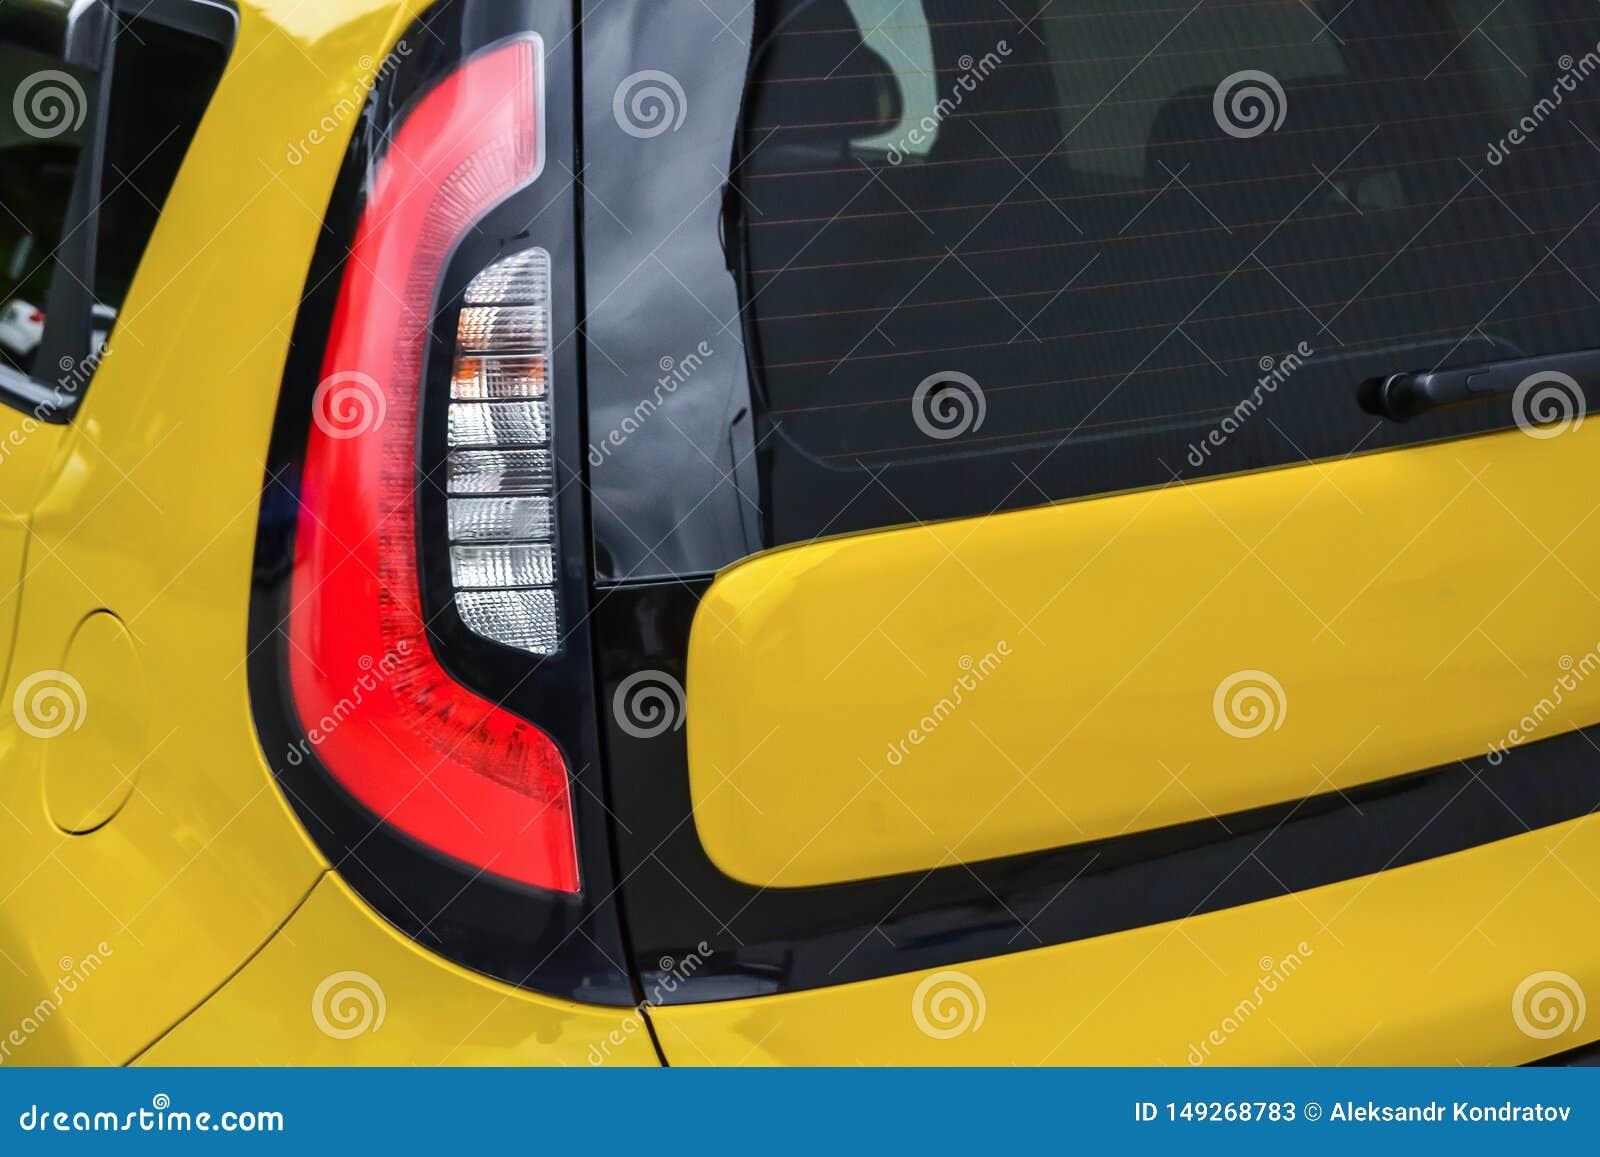 Bakre taillampsikt av den anv?nda bilen i gul f?rg, n?r att ha gjort ren f?r den inday f?rs?ljningen